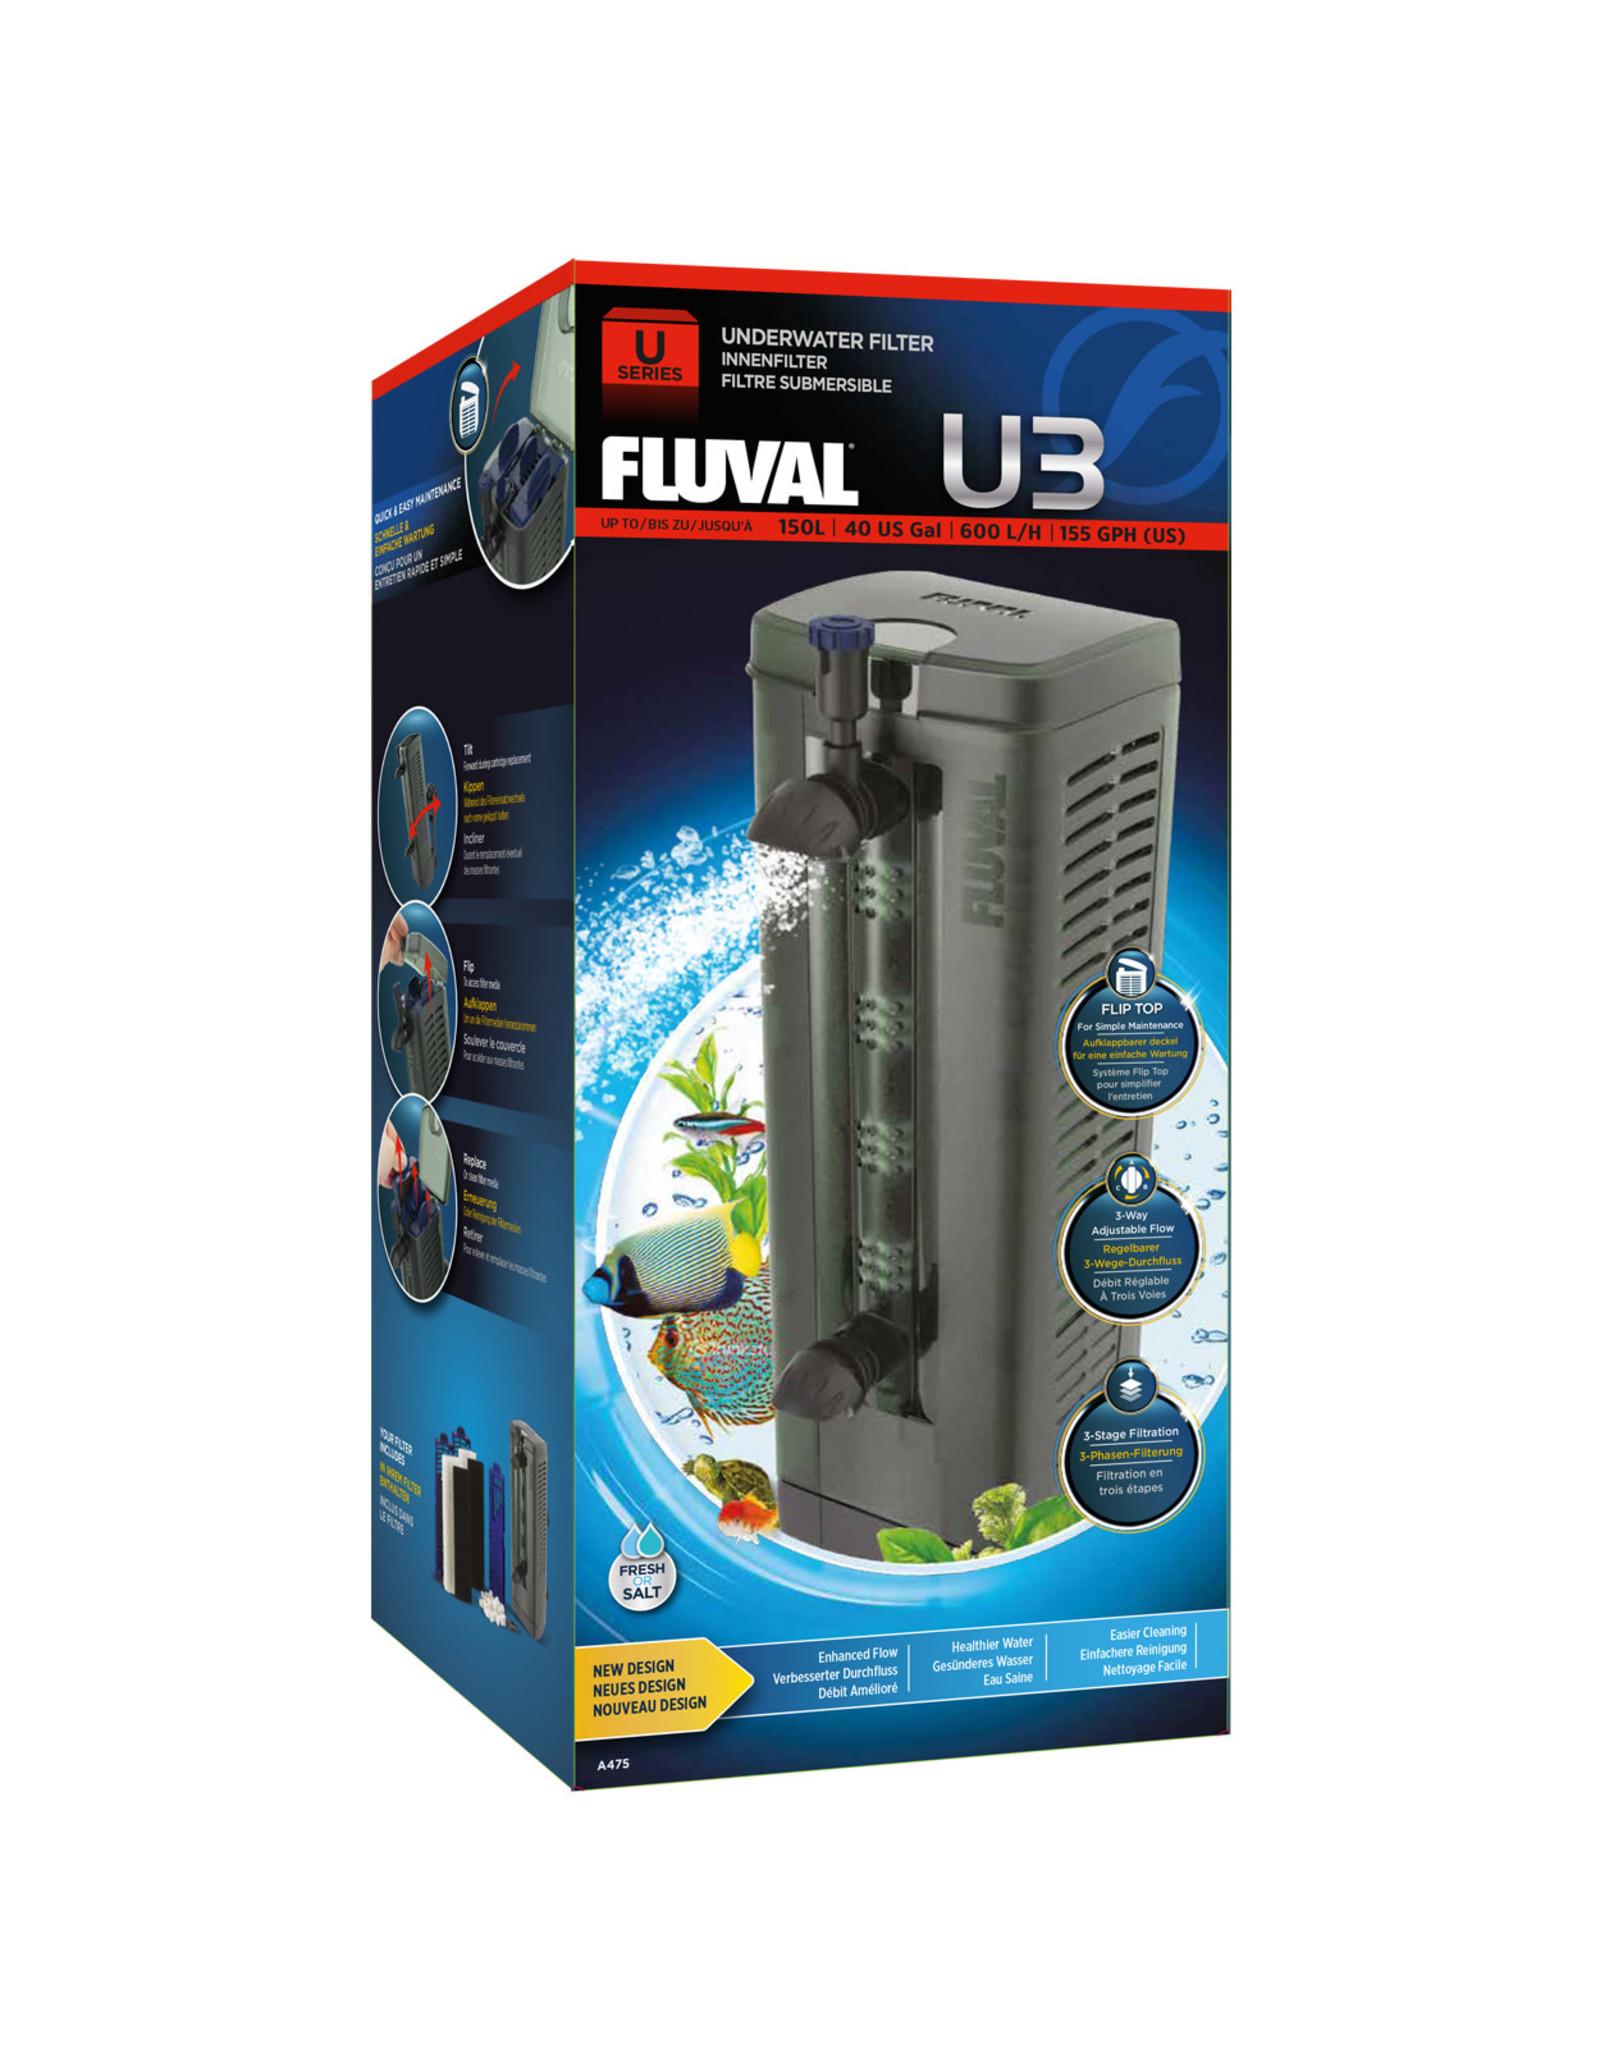 Fluval Fluval U3 Underwater Filter - 150 L (40 US Gal)